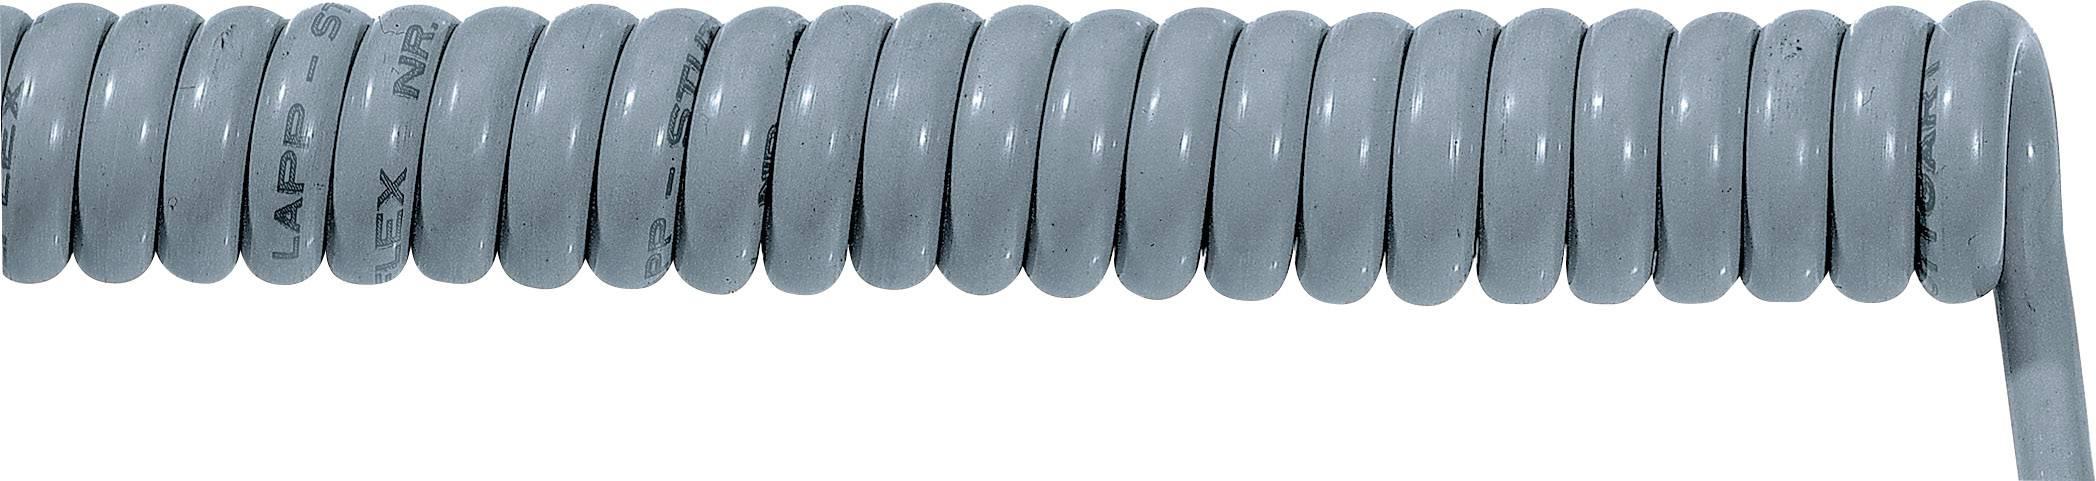 Spirálový kabel 73220310 UNITRONIC® SPIRAL LiF2Y11Y 4 x 0.14 mm², 100 mm / 400 mm, šedá